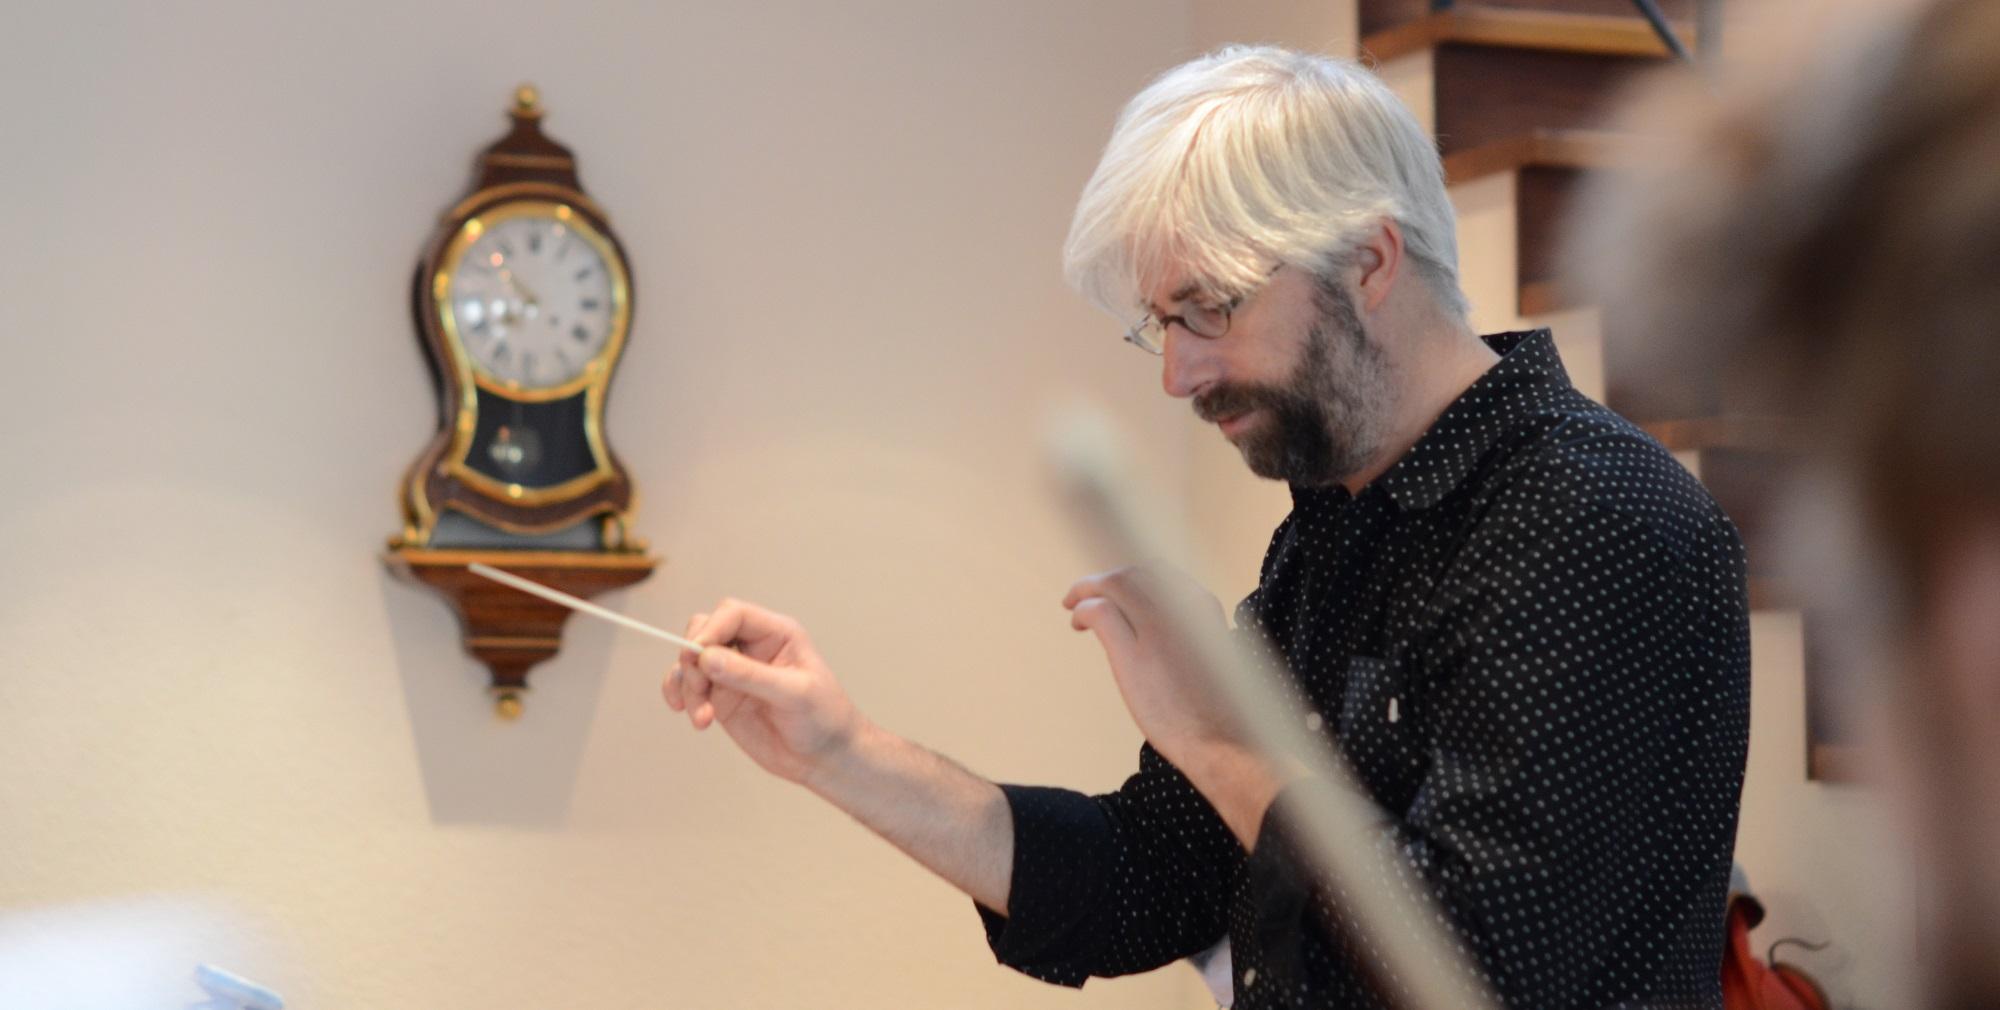 Dirigent Matthias Kuhn hat das ensemble proton bern 2011 gegründet